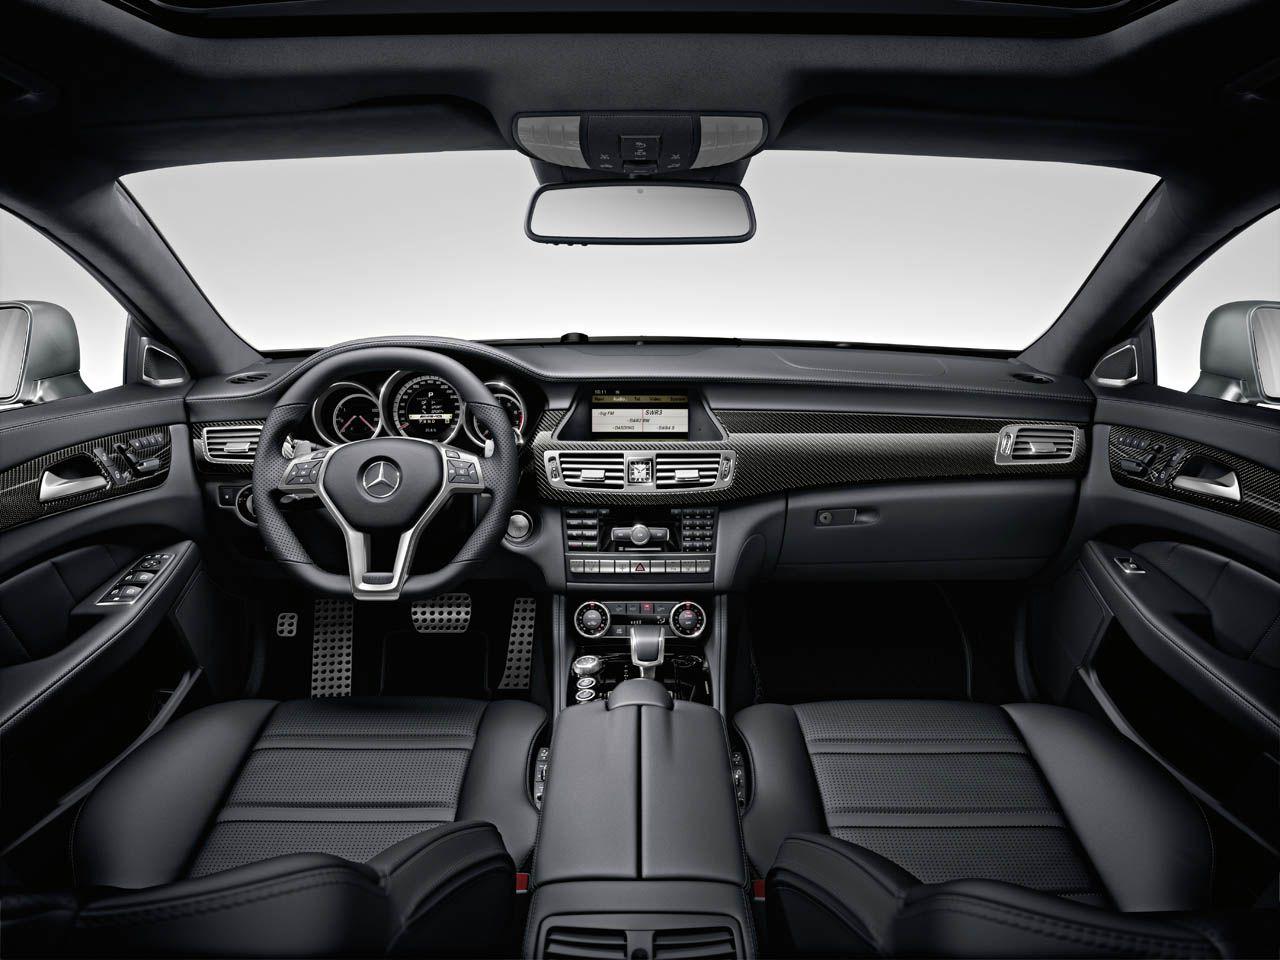 Mercedes Benz Cls Interior With Images Mercedes Cls Mercedes